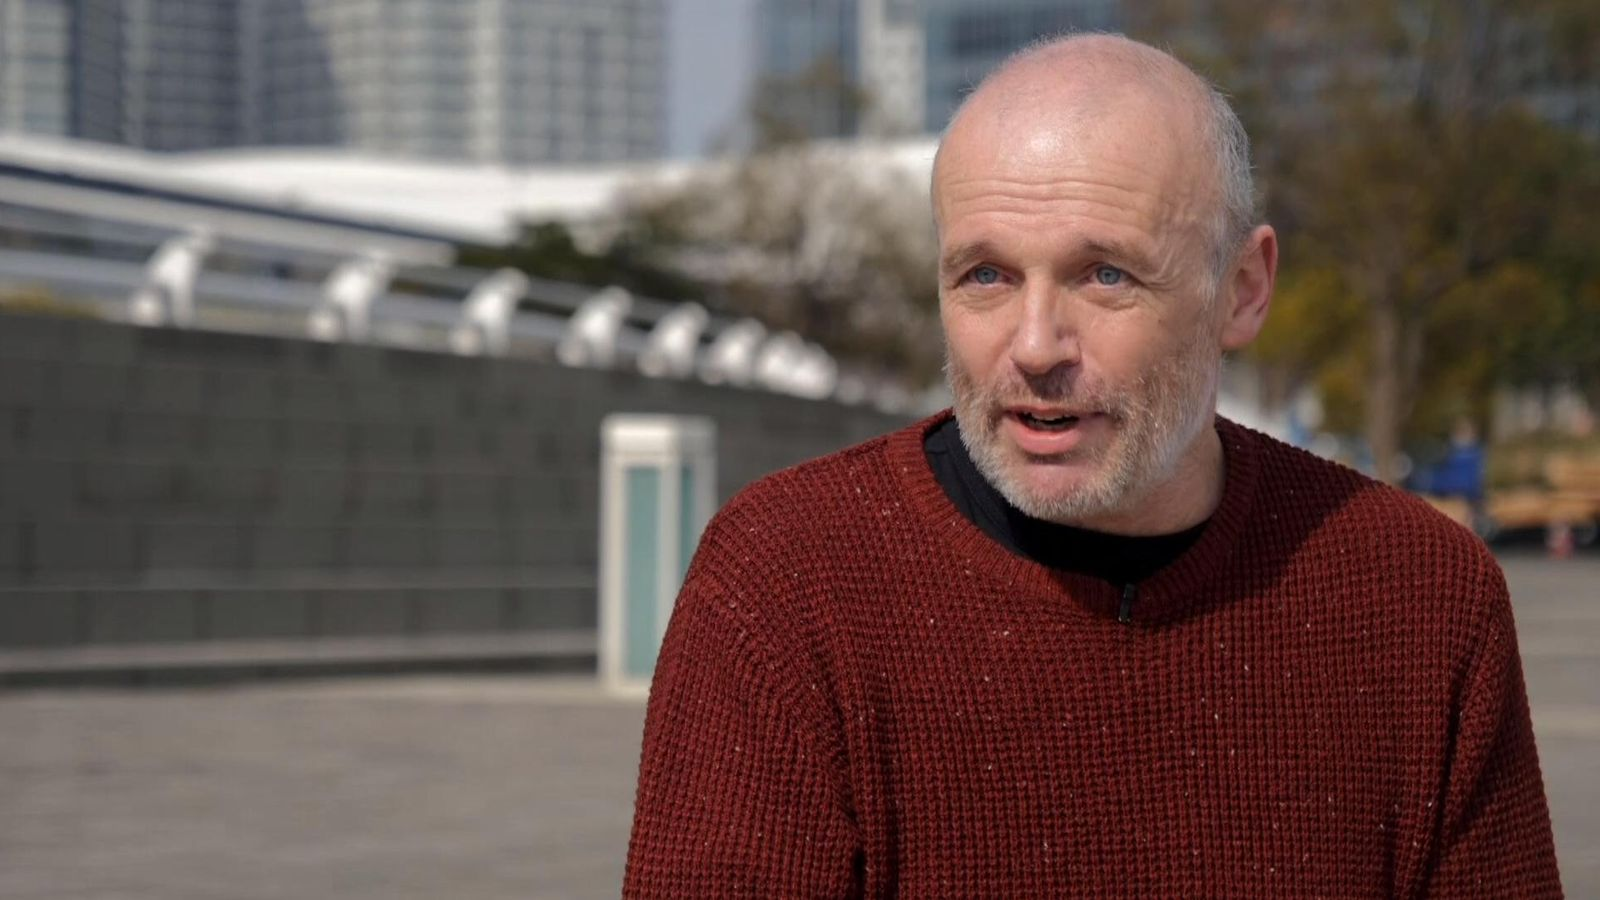 Coronavirus: Briton who caught COVID-19 calls ship's quarantine 'a joke'